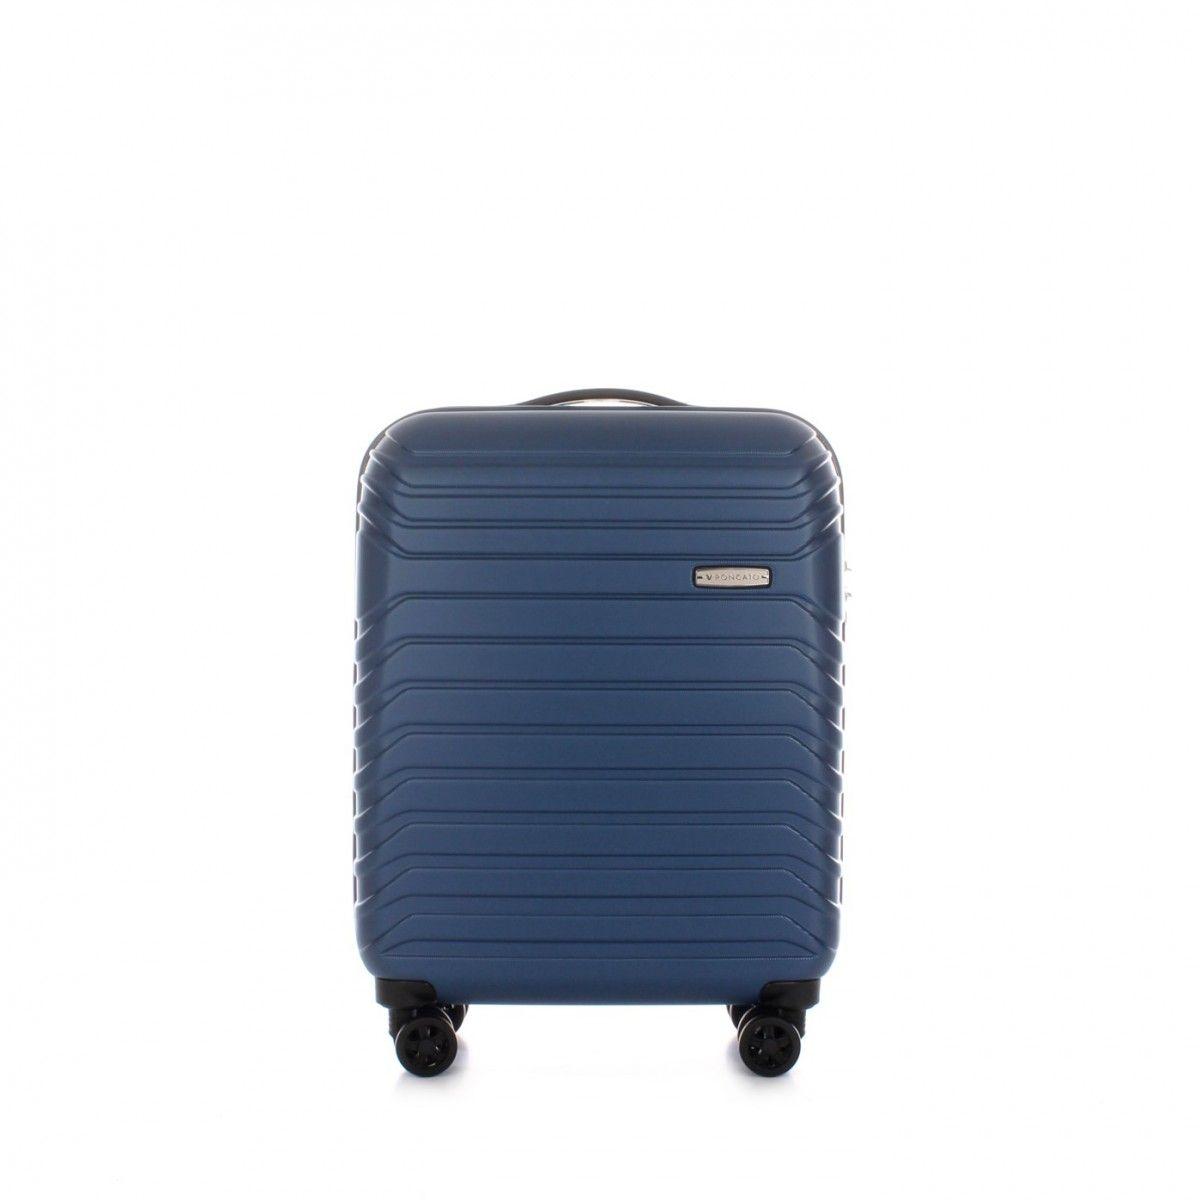 Roncato - Fusion tro cab 4r 03 blu 419453